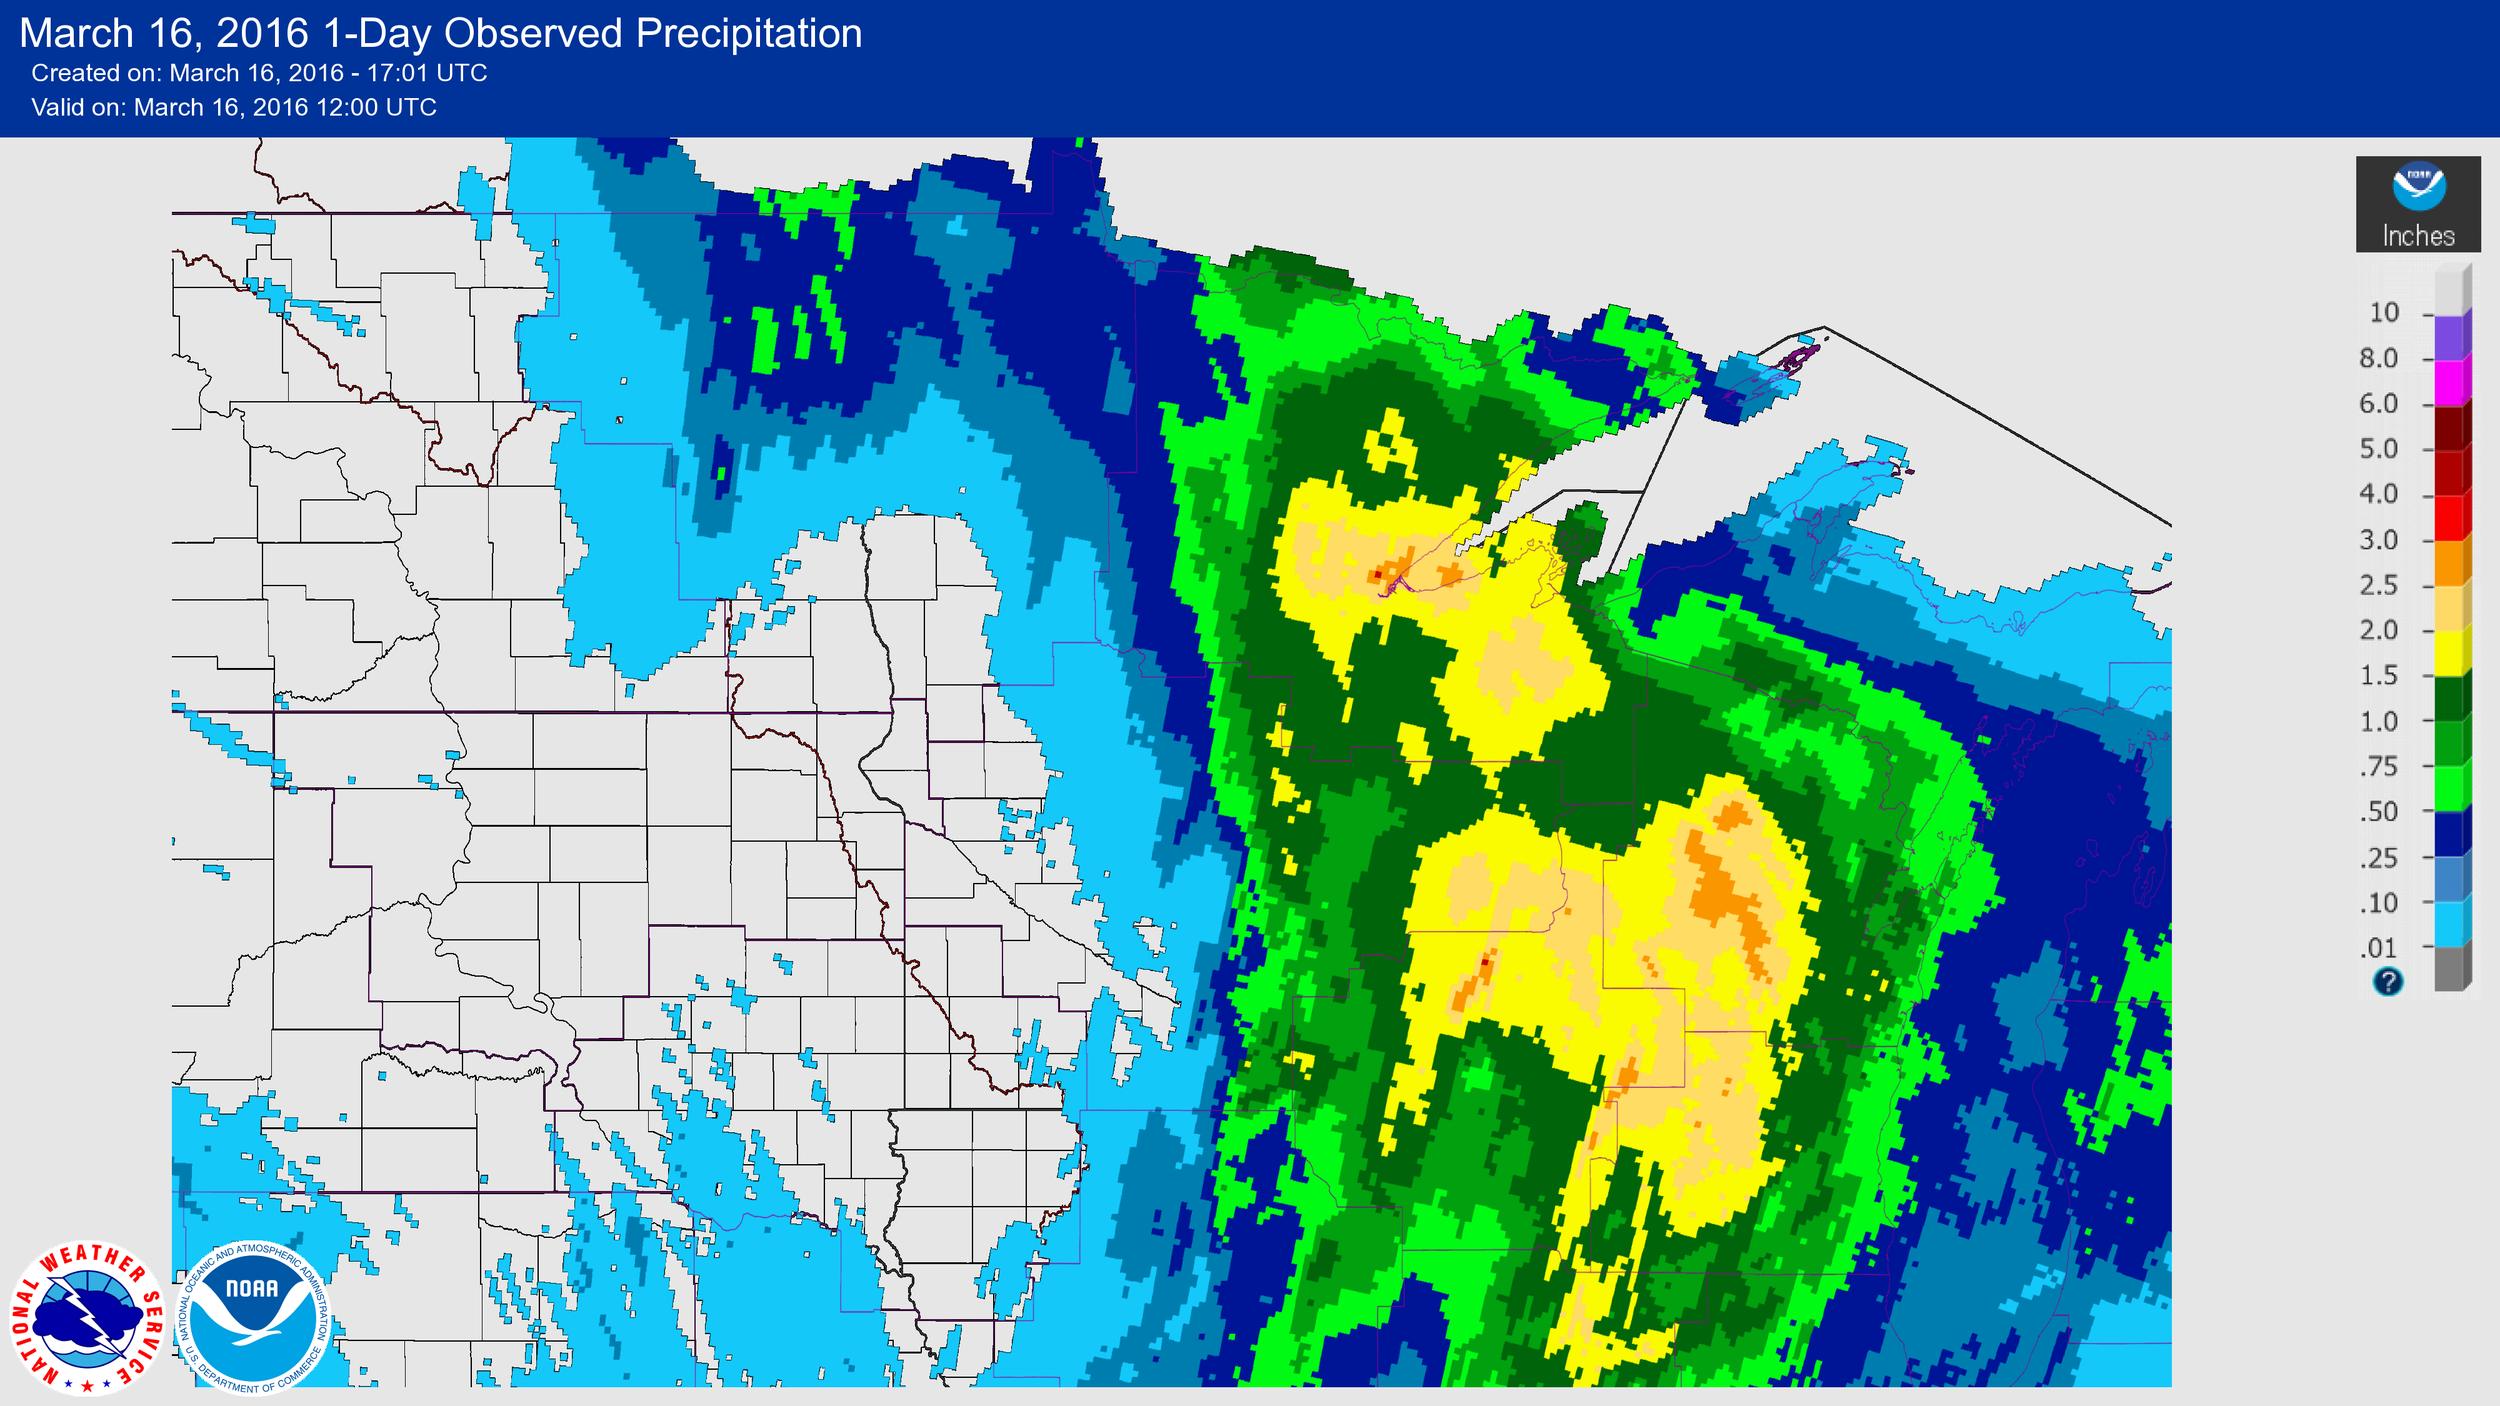 Radar-estimated 24-hour rainfall totals, ending 7am CDT March 16, 2016 (Credit: NOAA)